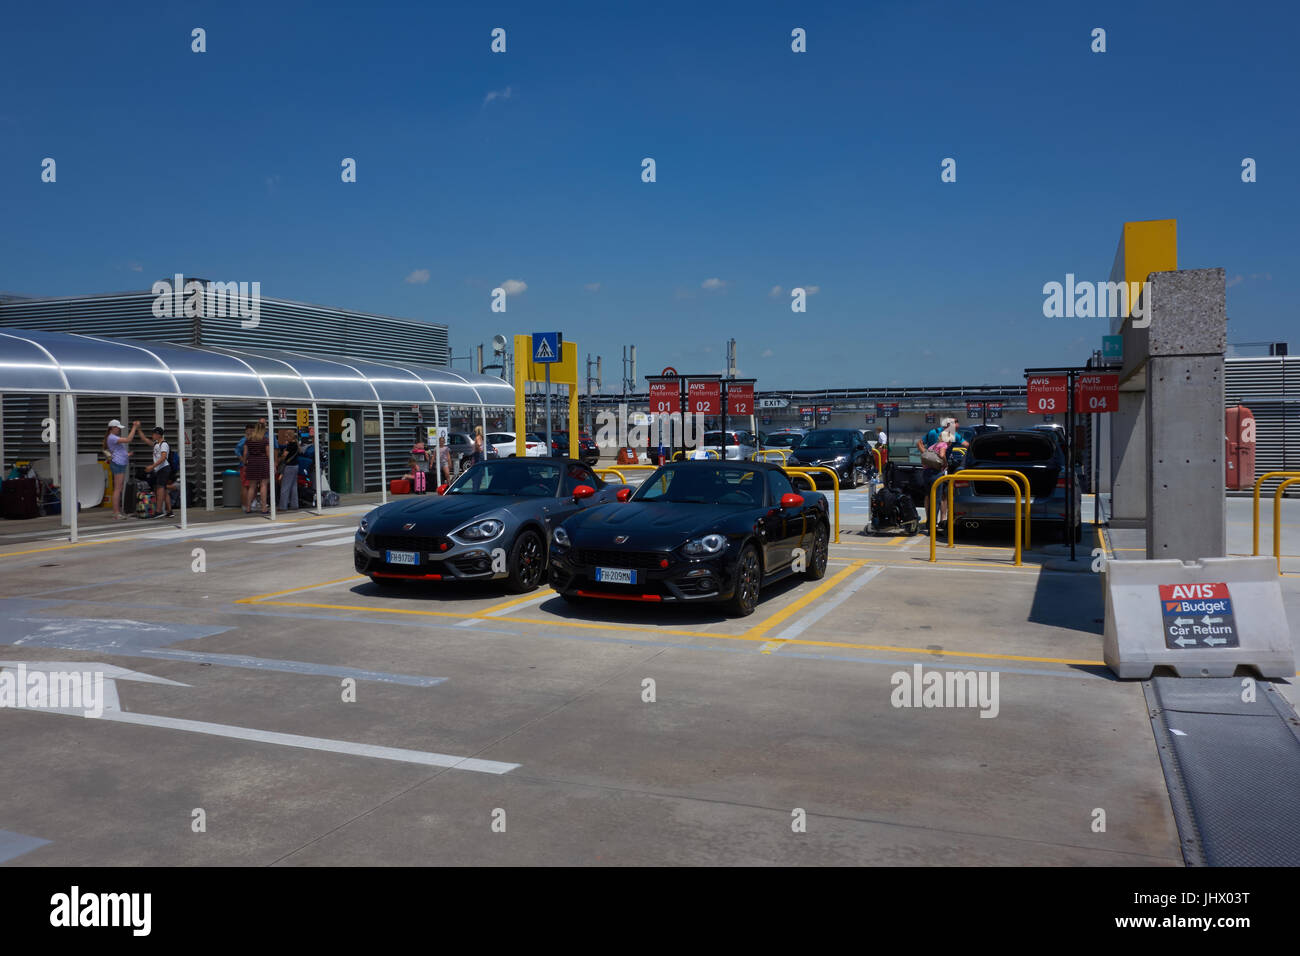 Car Rental Carpark At Venice Airport Italy Stock Photo 148702956